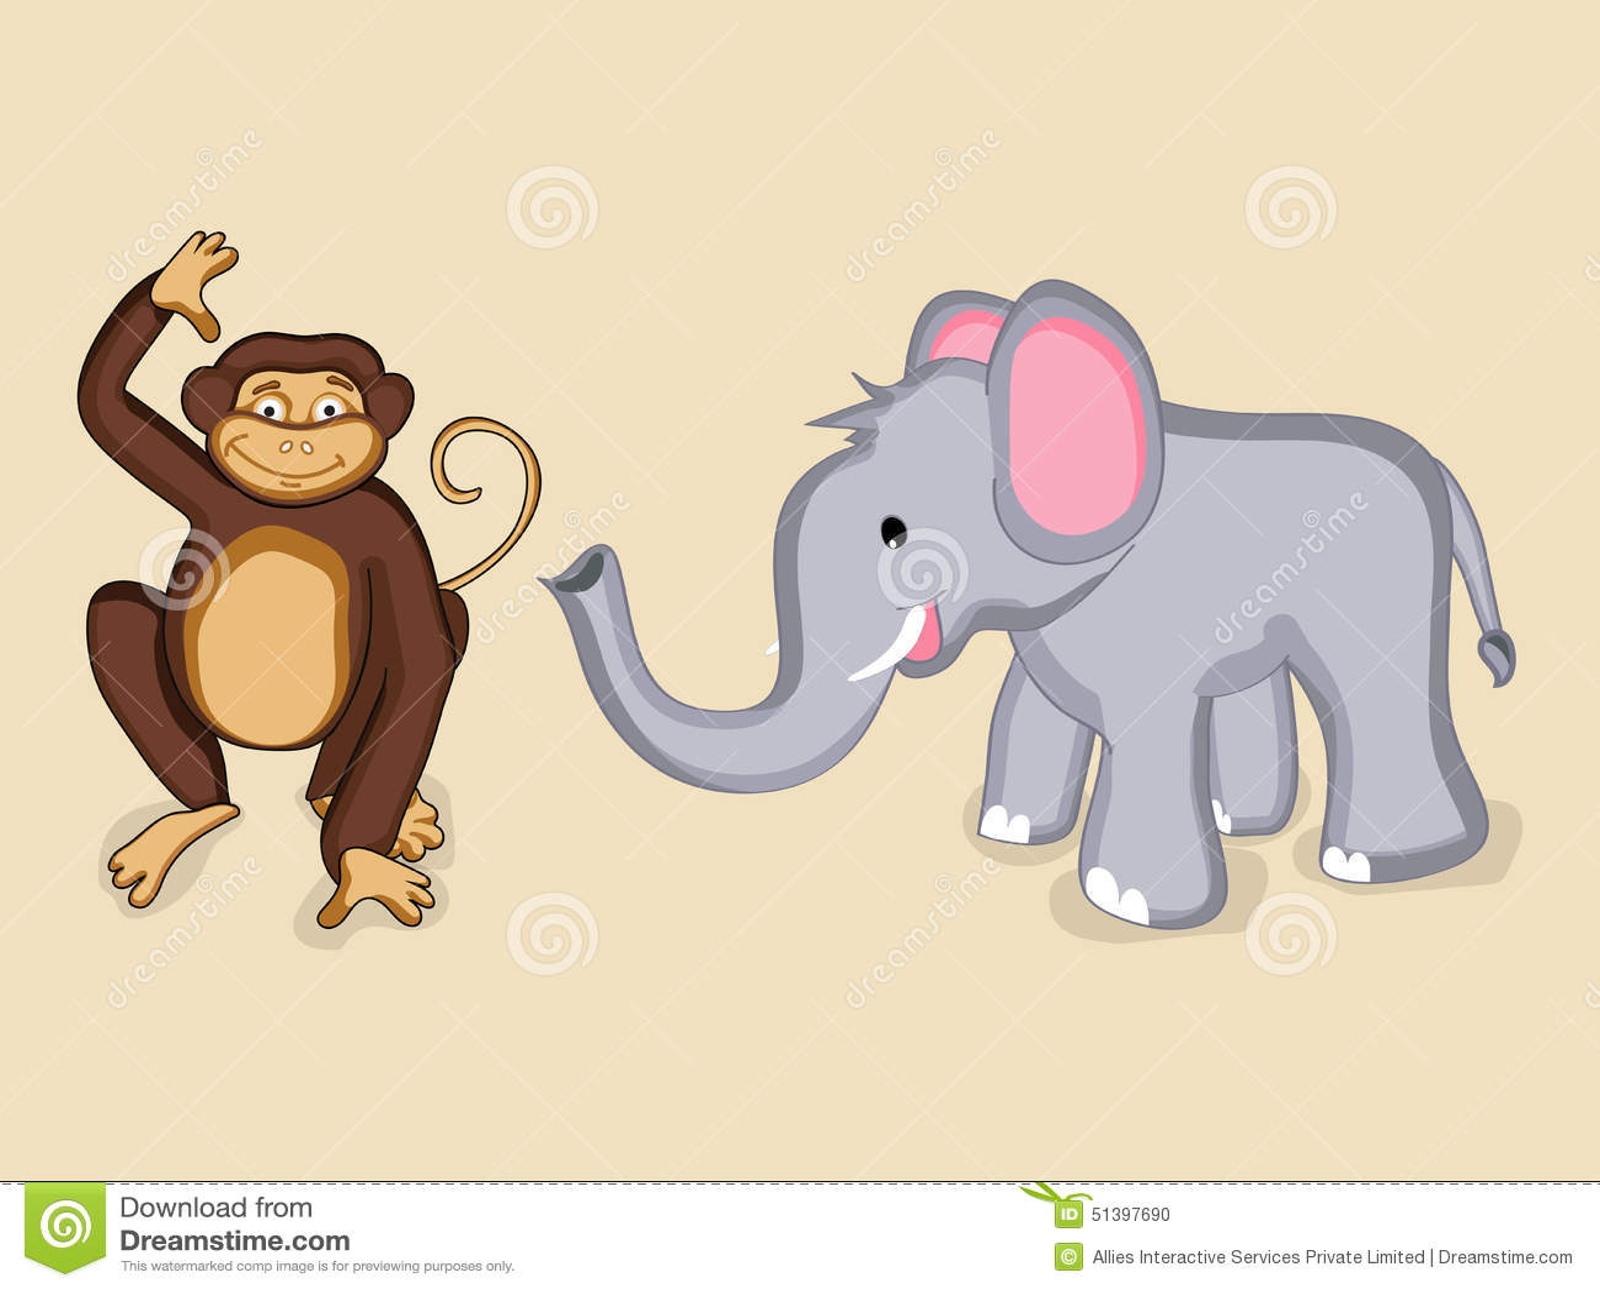 Cute Animal Characters. Stock Illustration. Illustration